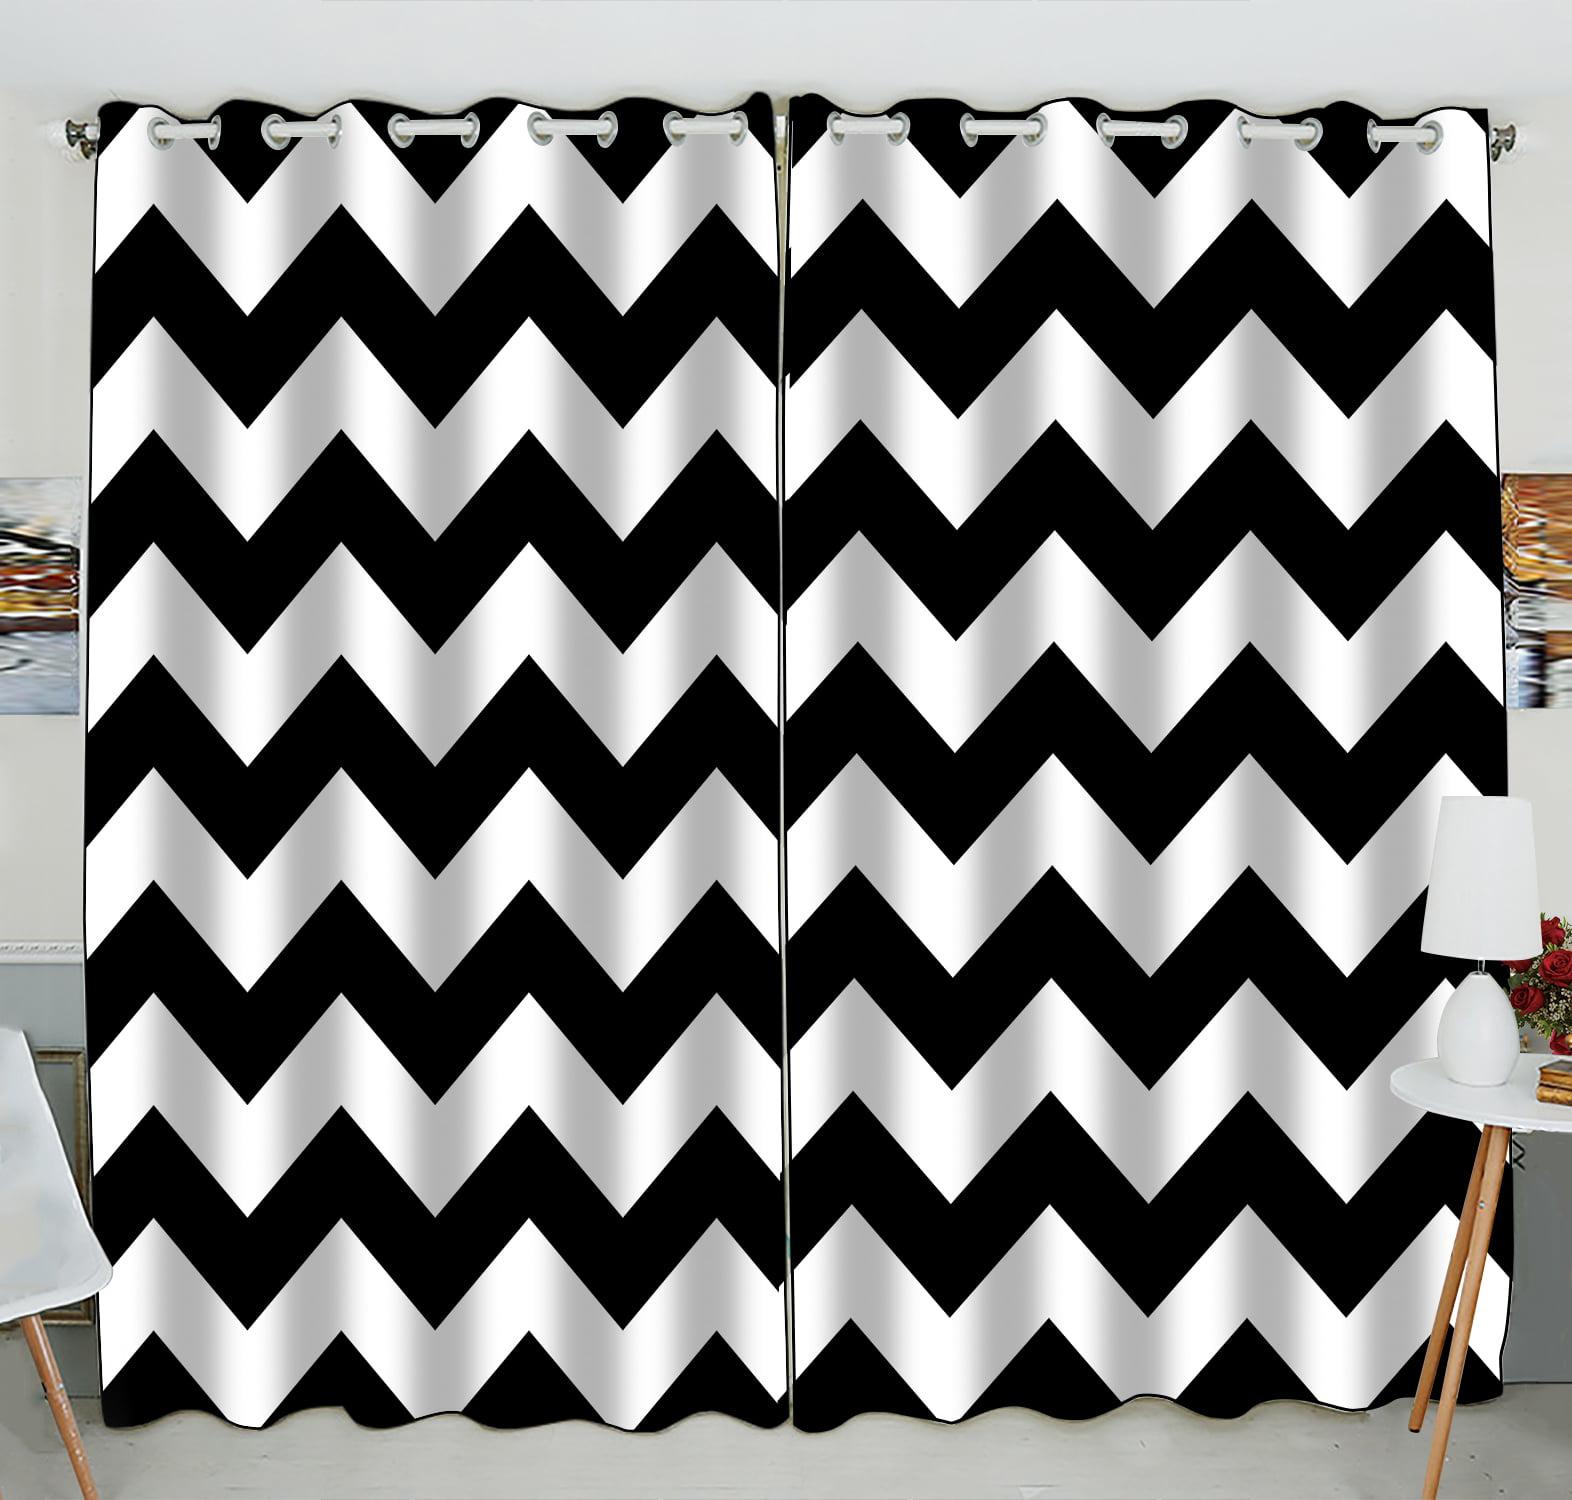 Gckg Stripe Window Curtain Black White Chevron Zigzag Stripe Pattern Grommet Blackout Curtain Room Darkening Curtains For Bedroom And Kitchen Size 52 W X 84 H Inches Two Piece Walmart Com Walmart Com